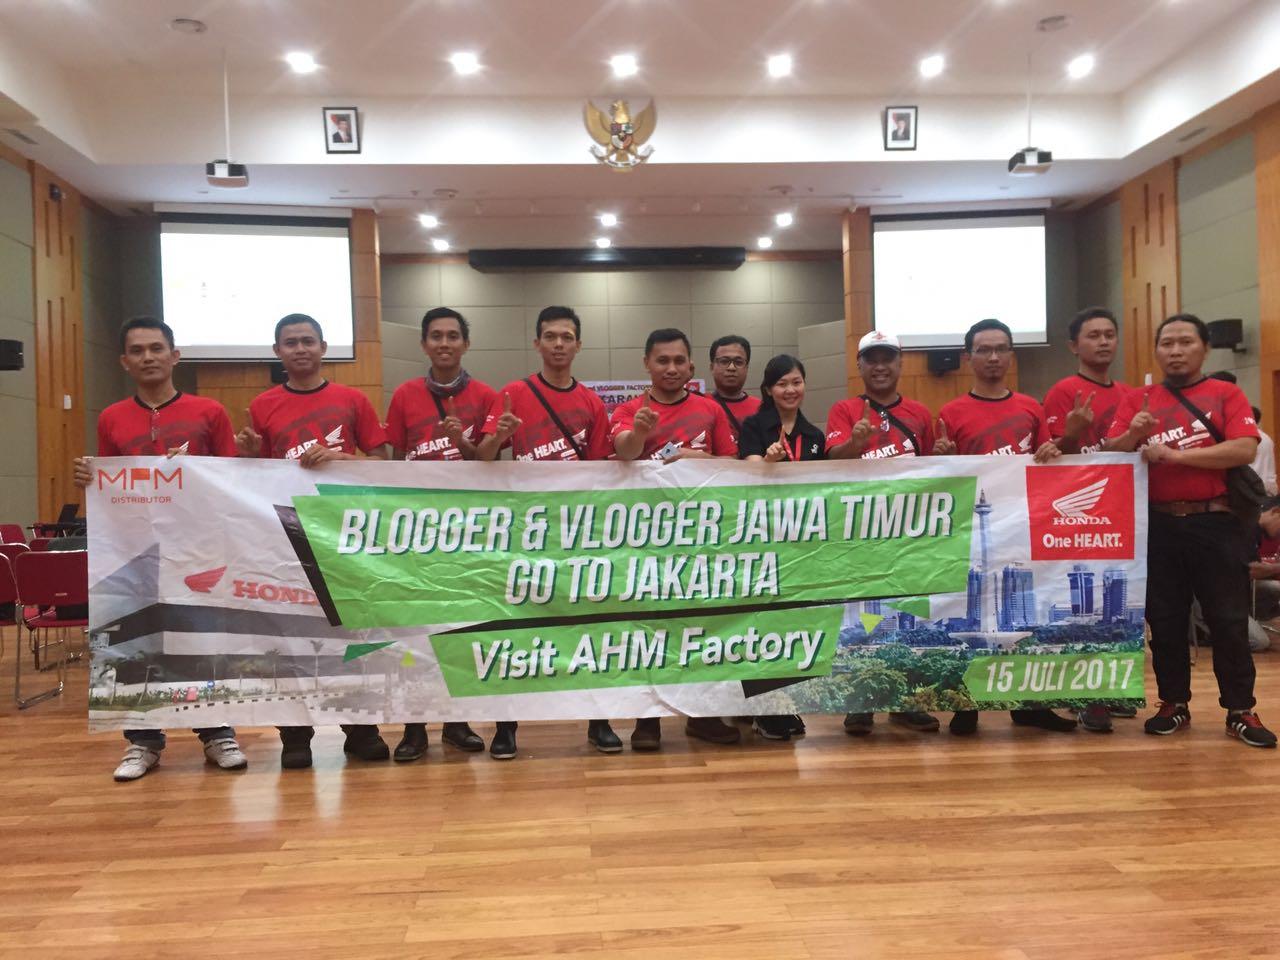 Blogger dan Vlogger Jawa Timur kunjungi pabrik motor Honda di Plant Karawang Juli tahun 2017 (1)